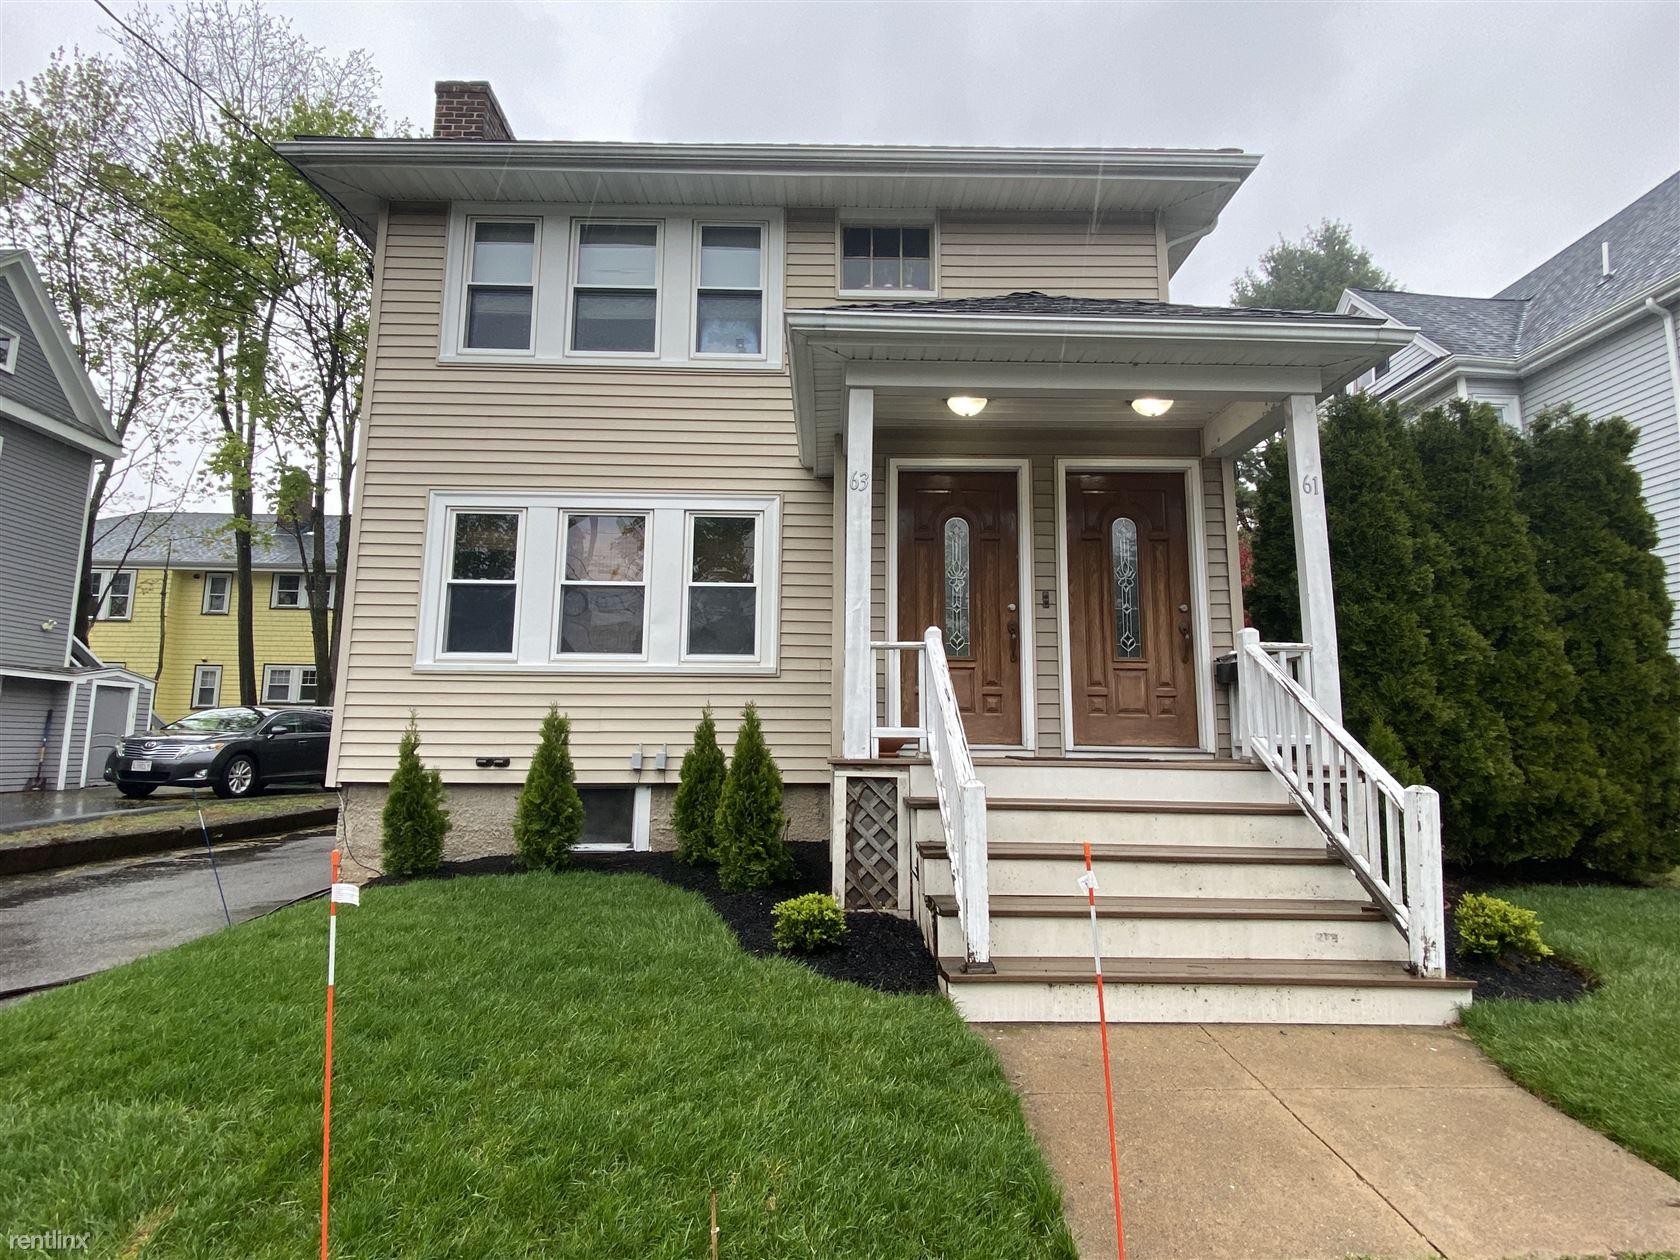 63 Newell Rd, Auburndale, MA - $2,250 USD/ month